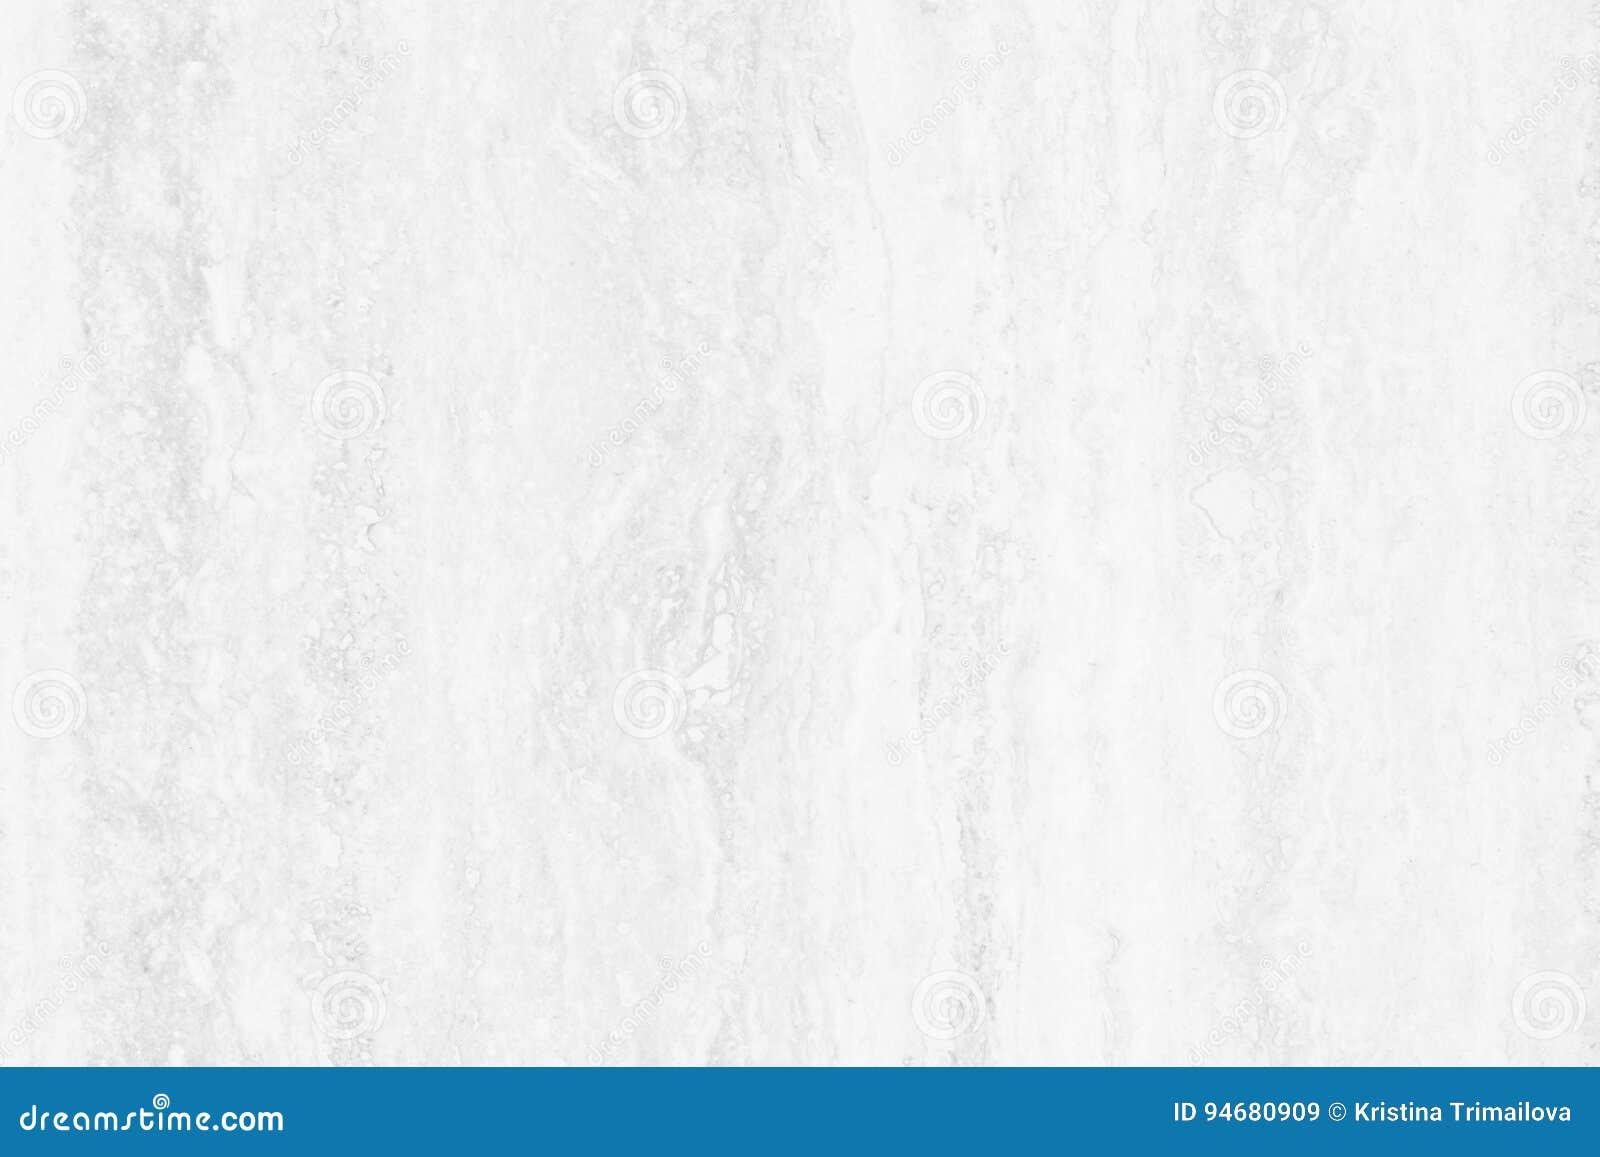 Biel tekstury marmurowy tło, abstrakt marmurowej tekstury naturalni wzory dla projekta